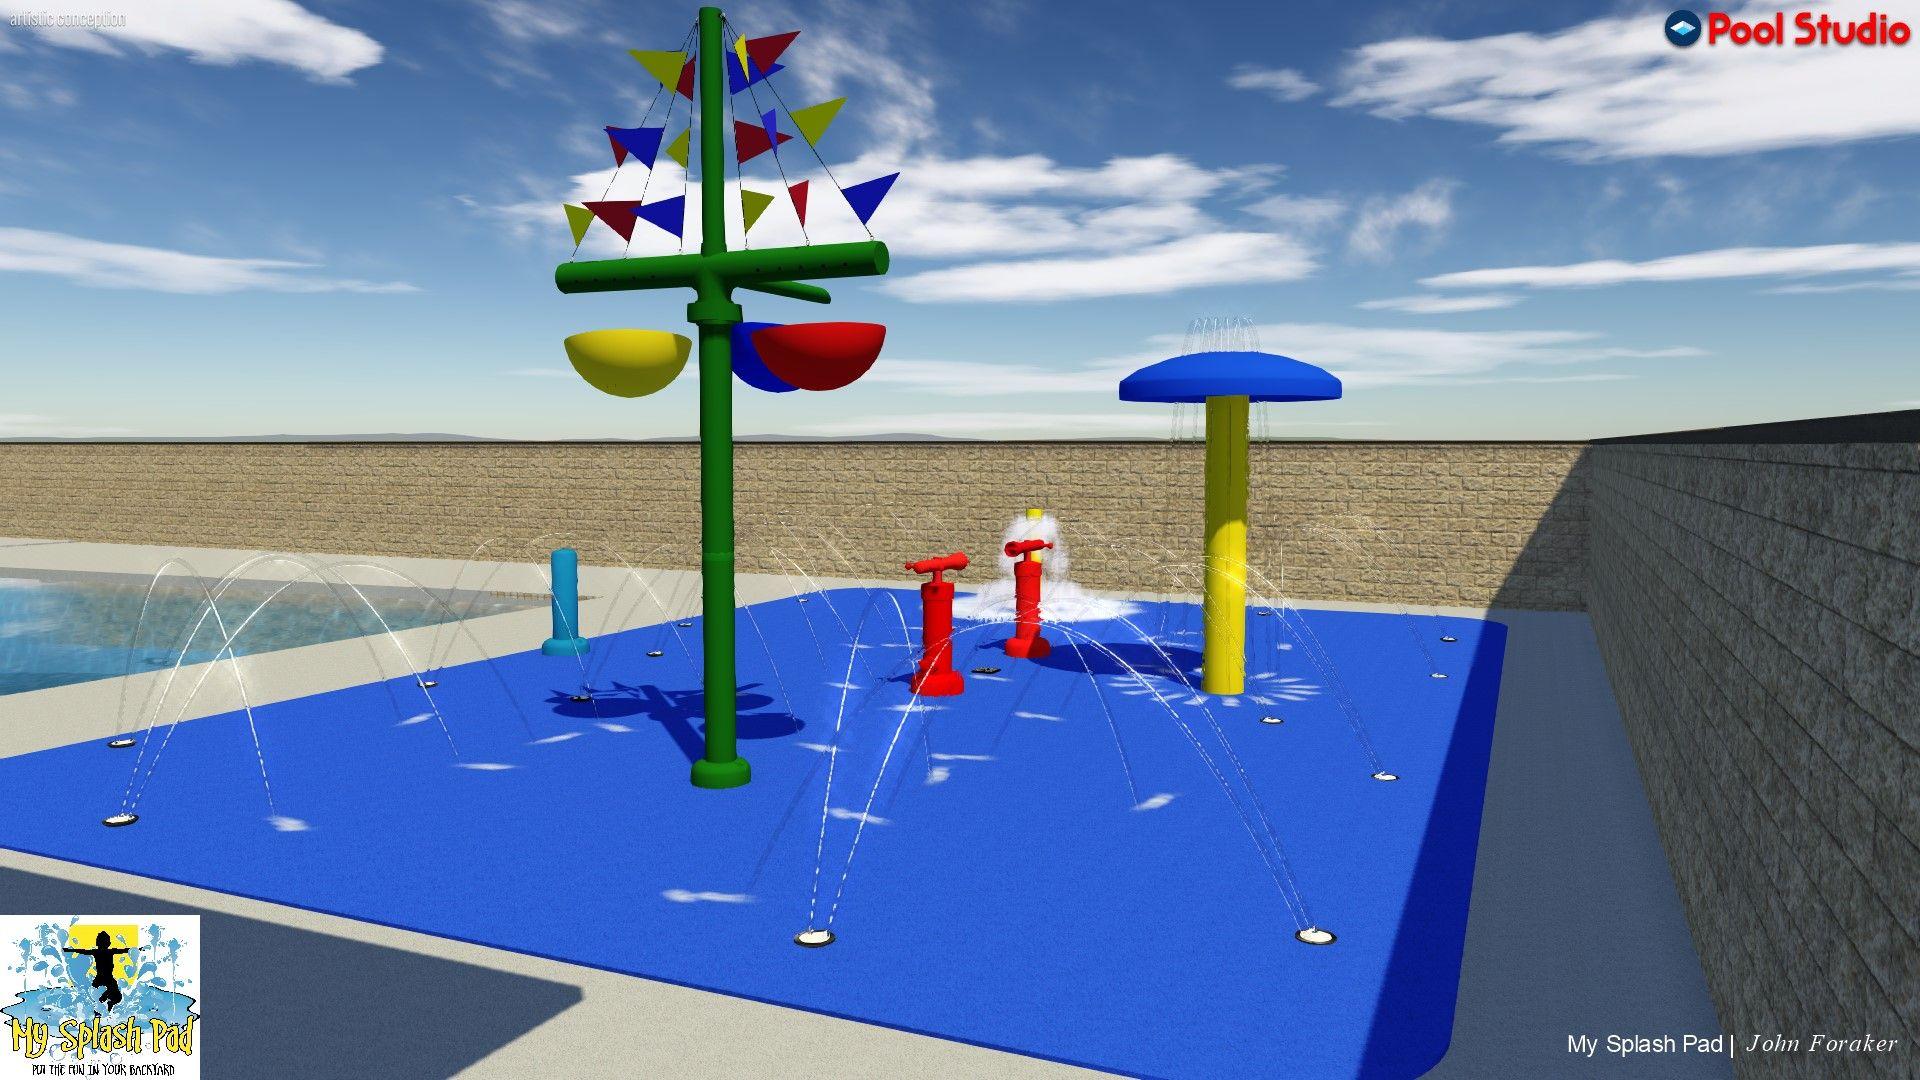 Splash Pad Installation, Kits & Water Playground Equipment #largeumbrella